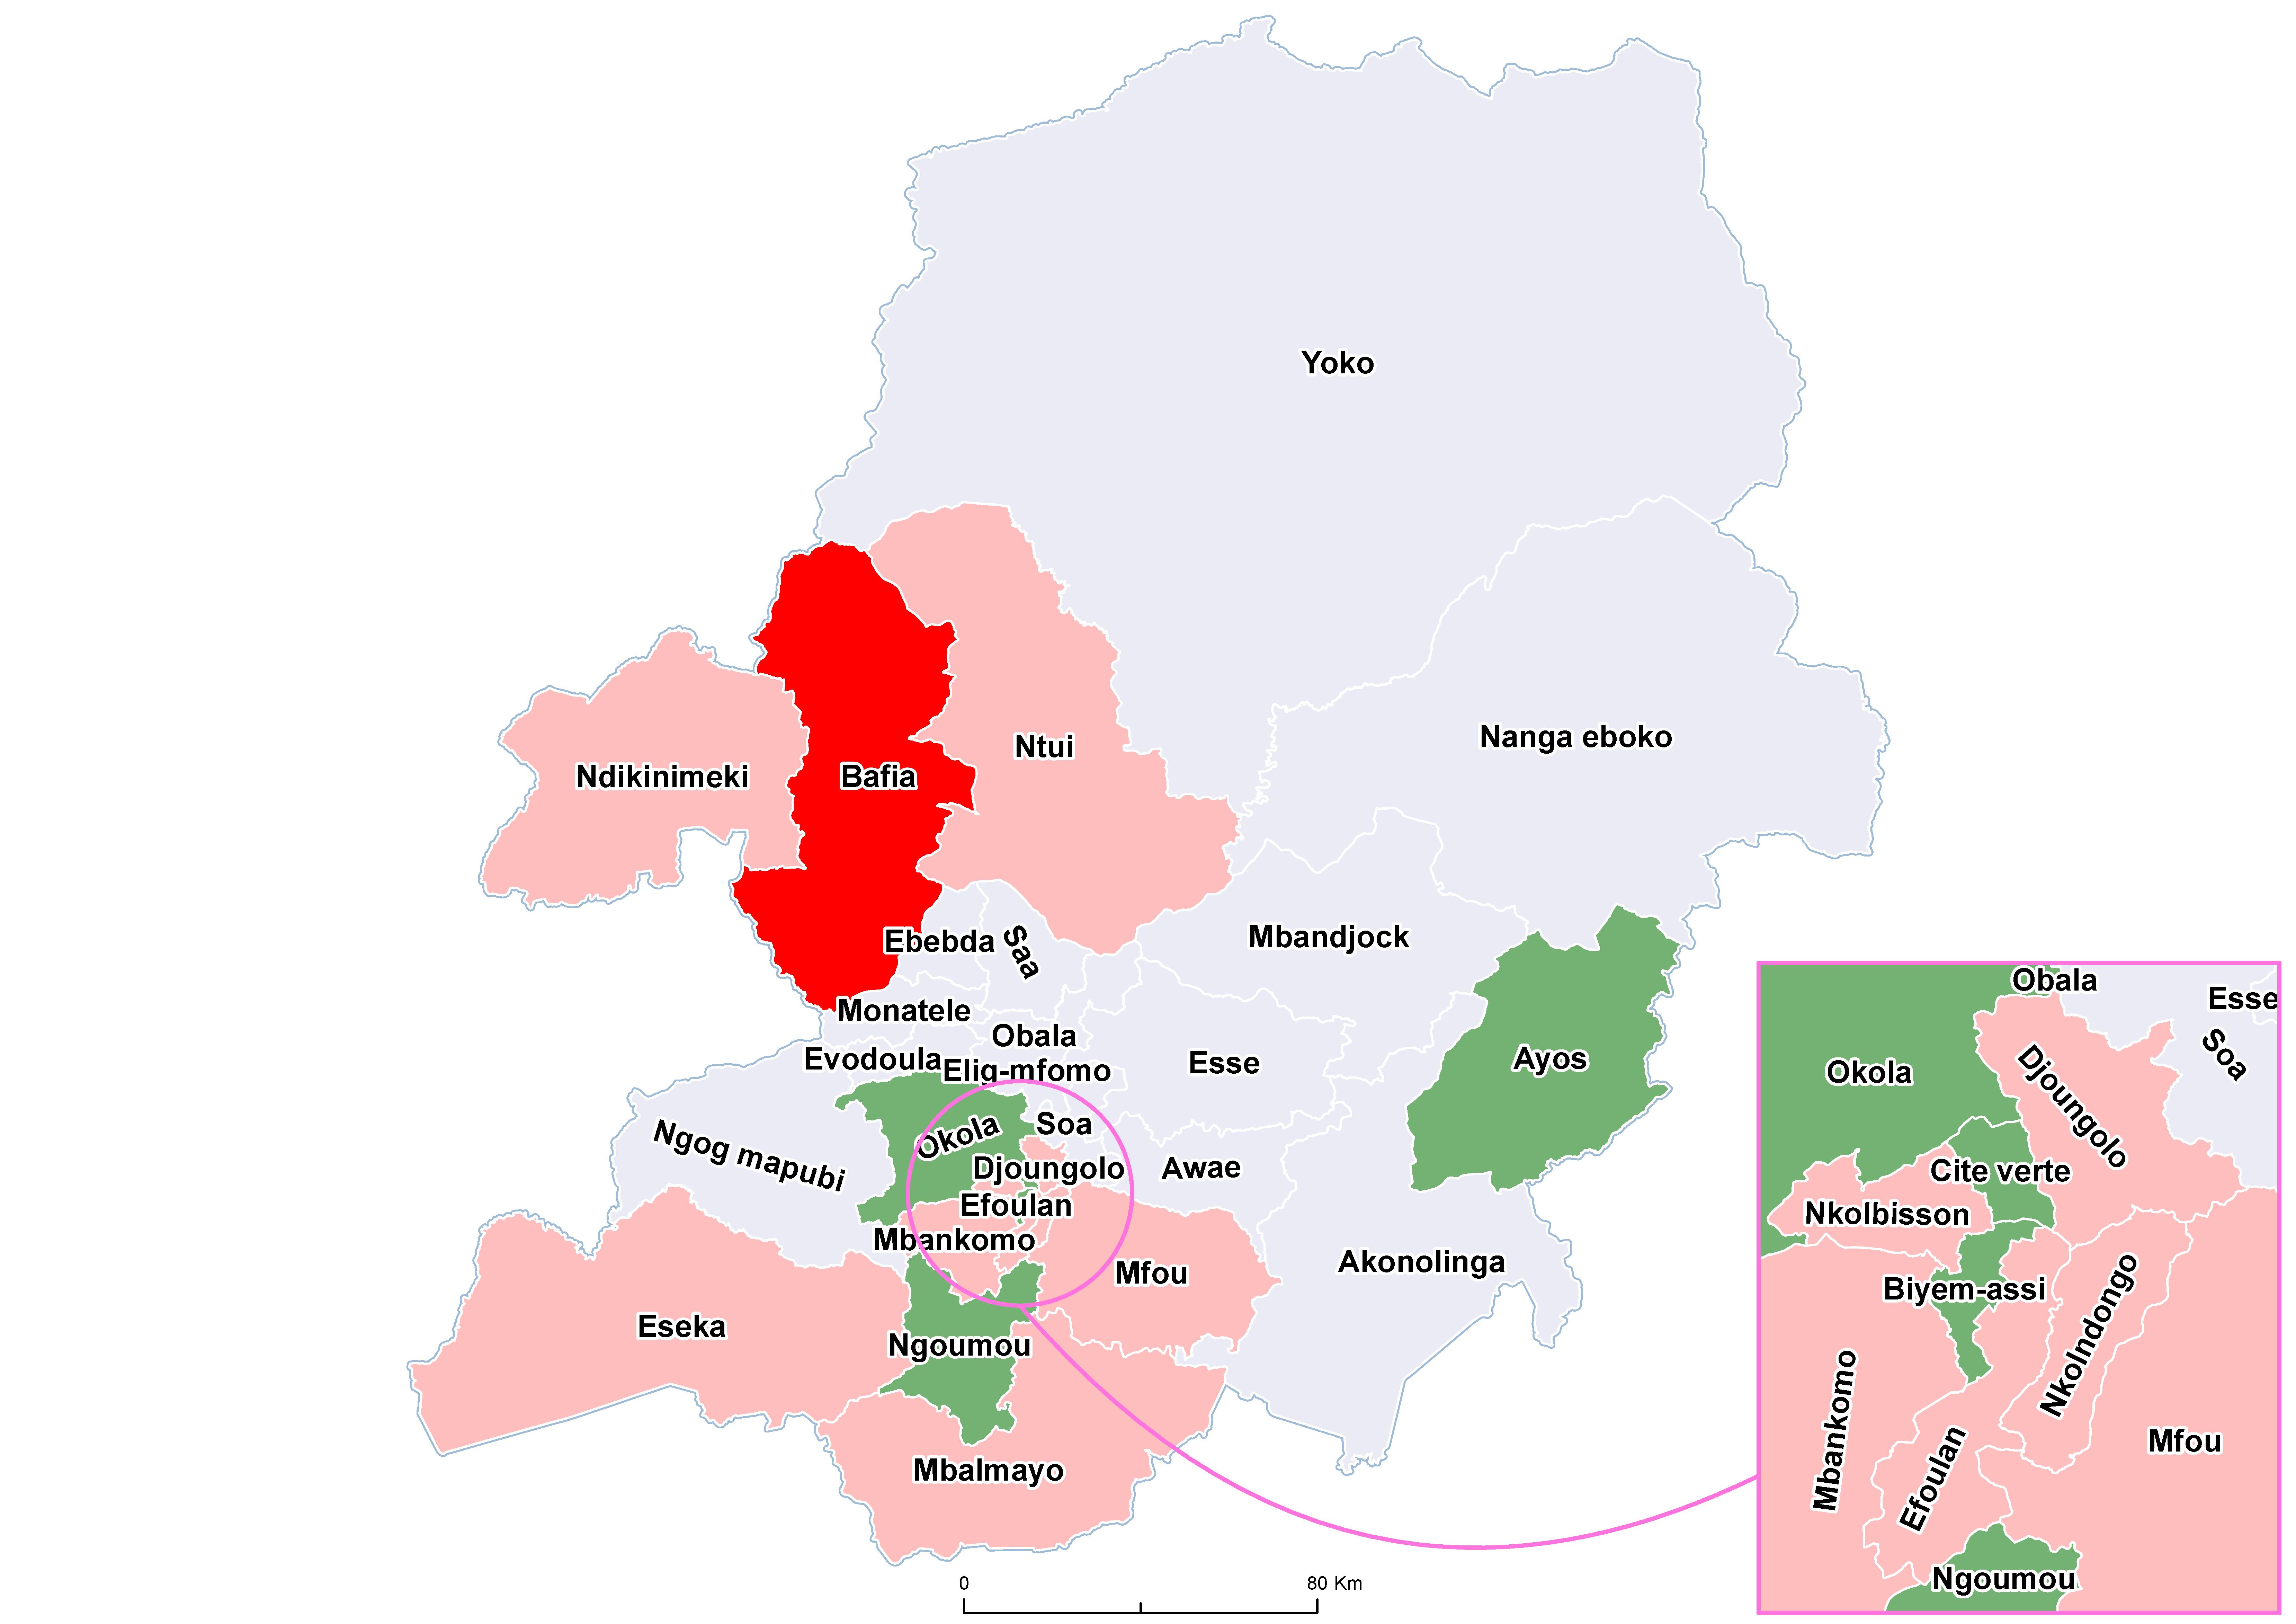 Centre Mean SCH Prevalence 20180001